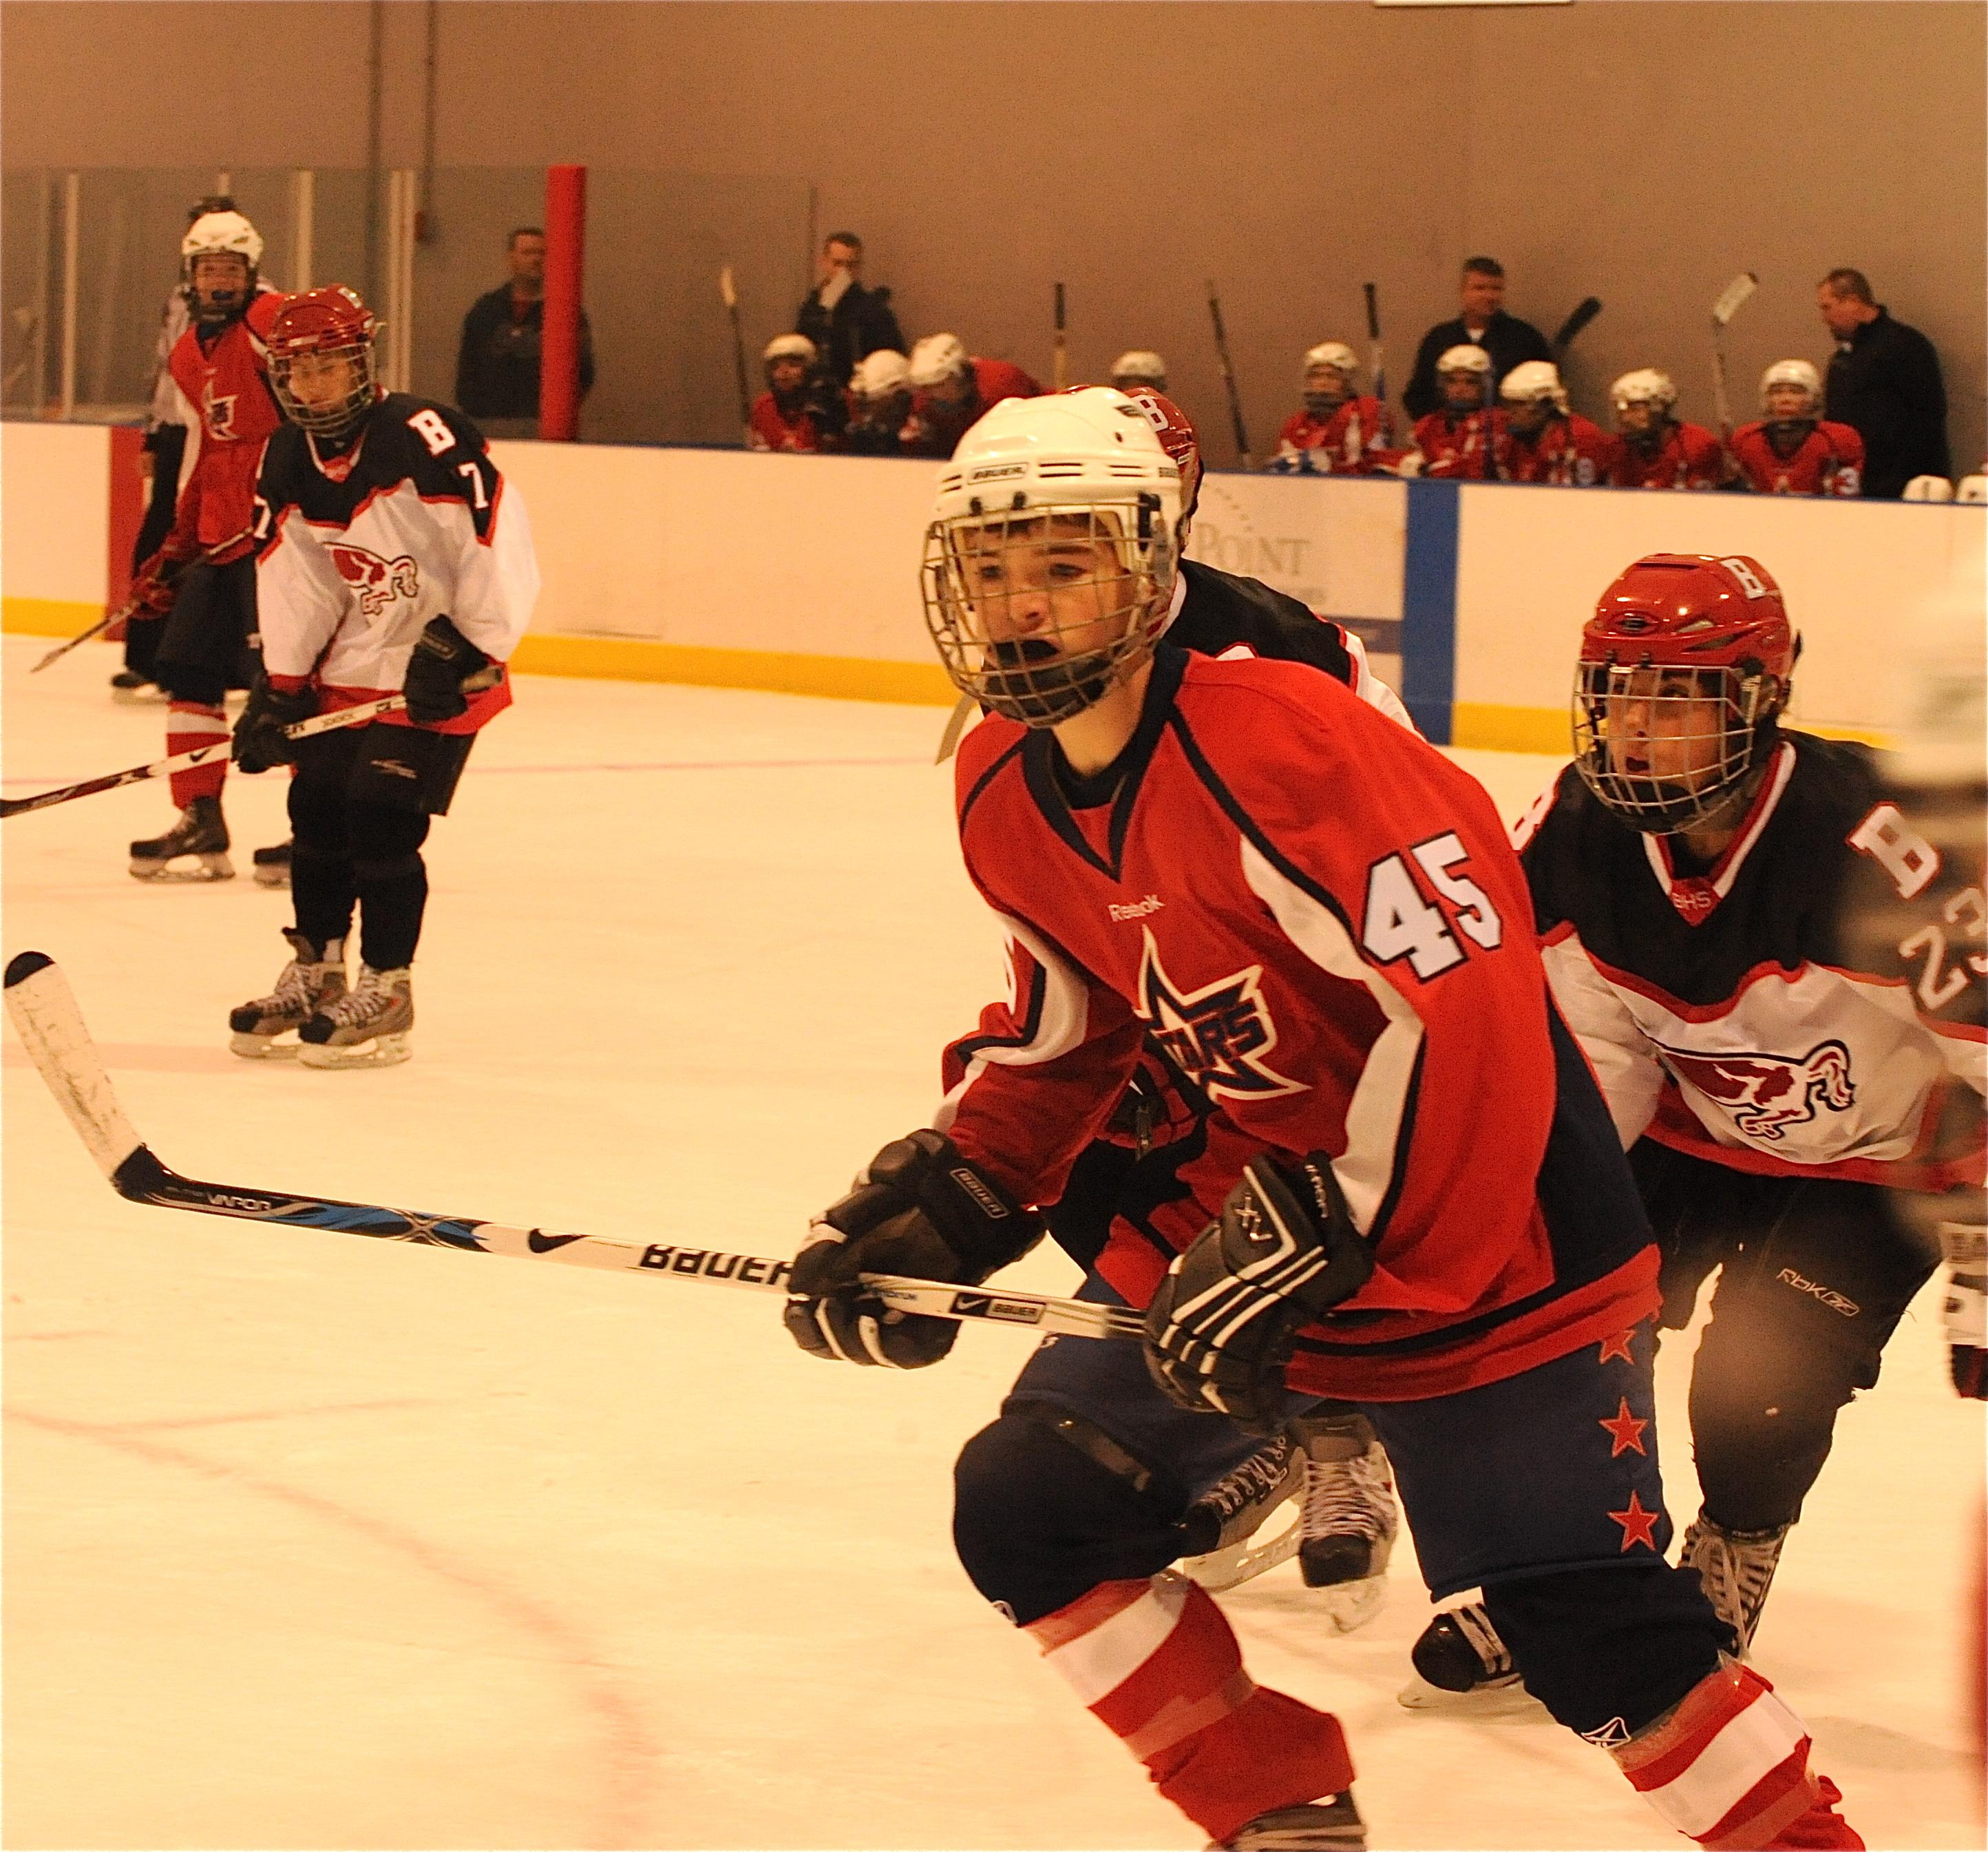 Suburban stars midget hockey